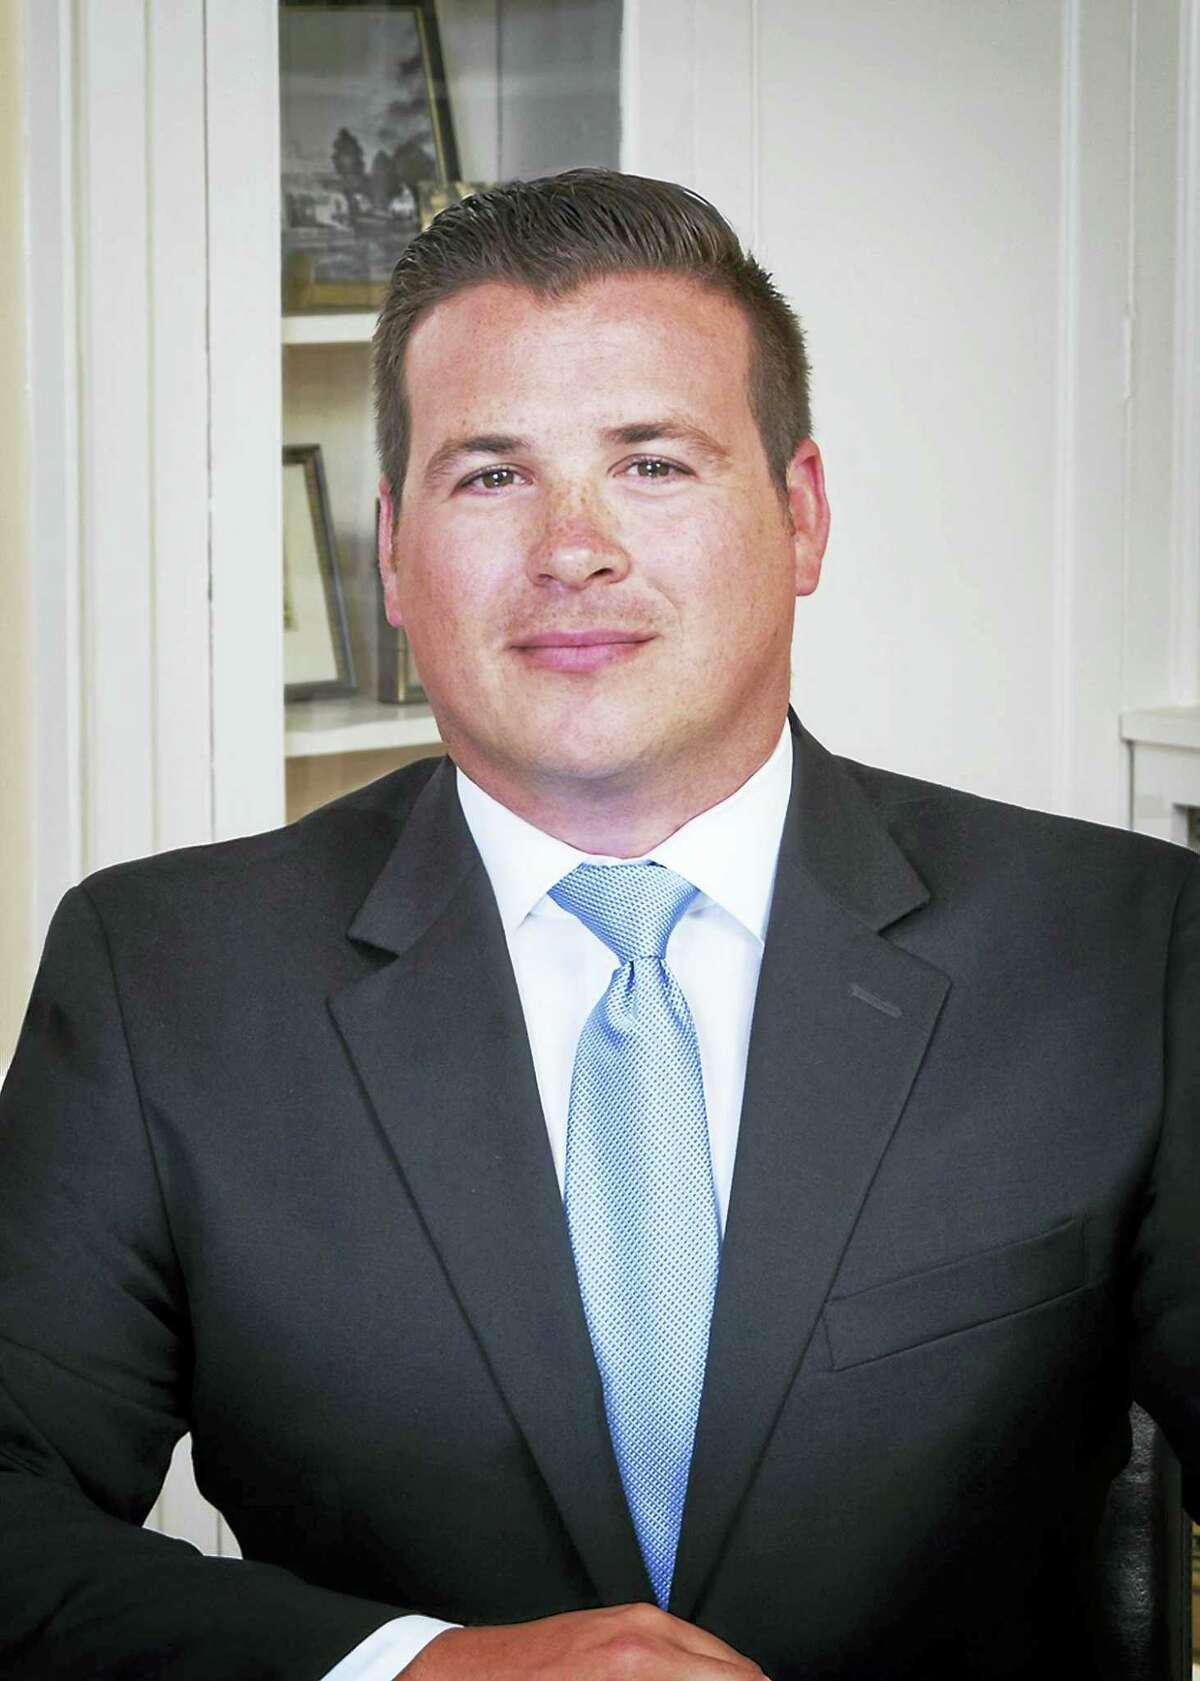 Joshua Weinshank